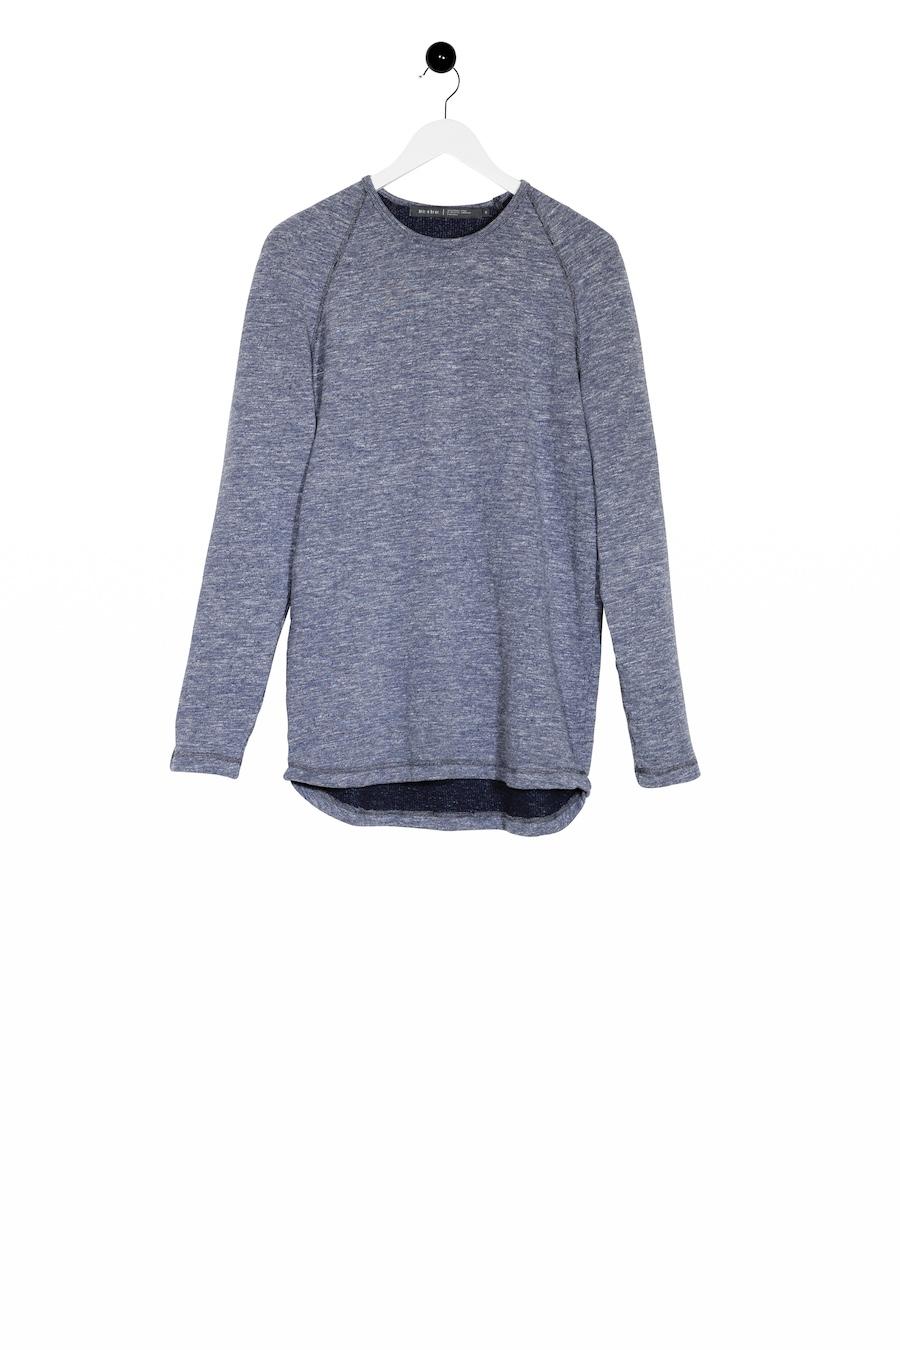 Yddinge Sweater